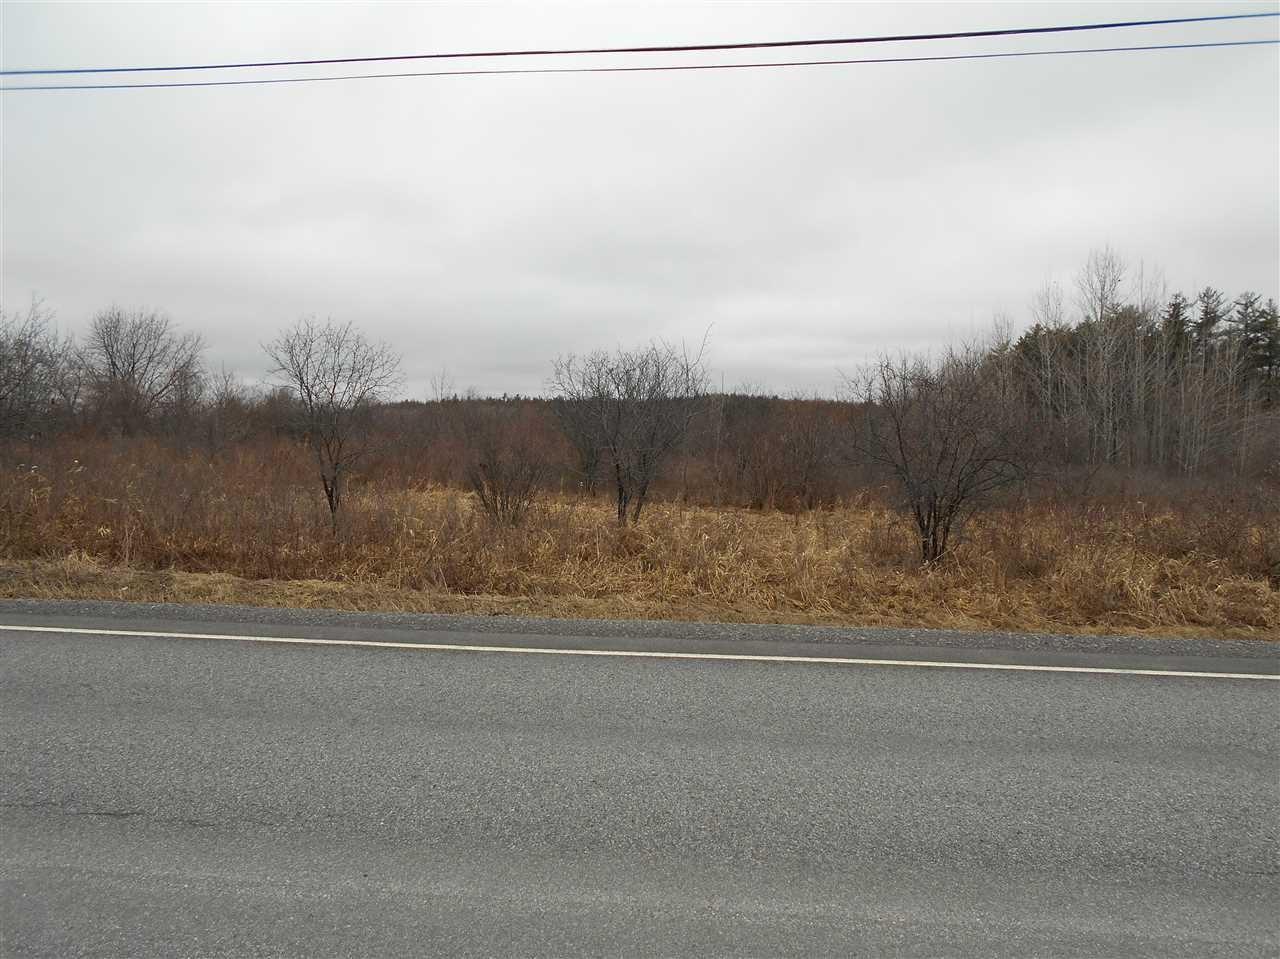 0 DUANESBURG RD, Duanesburg, NY 12056